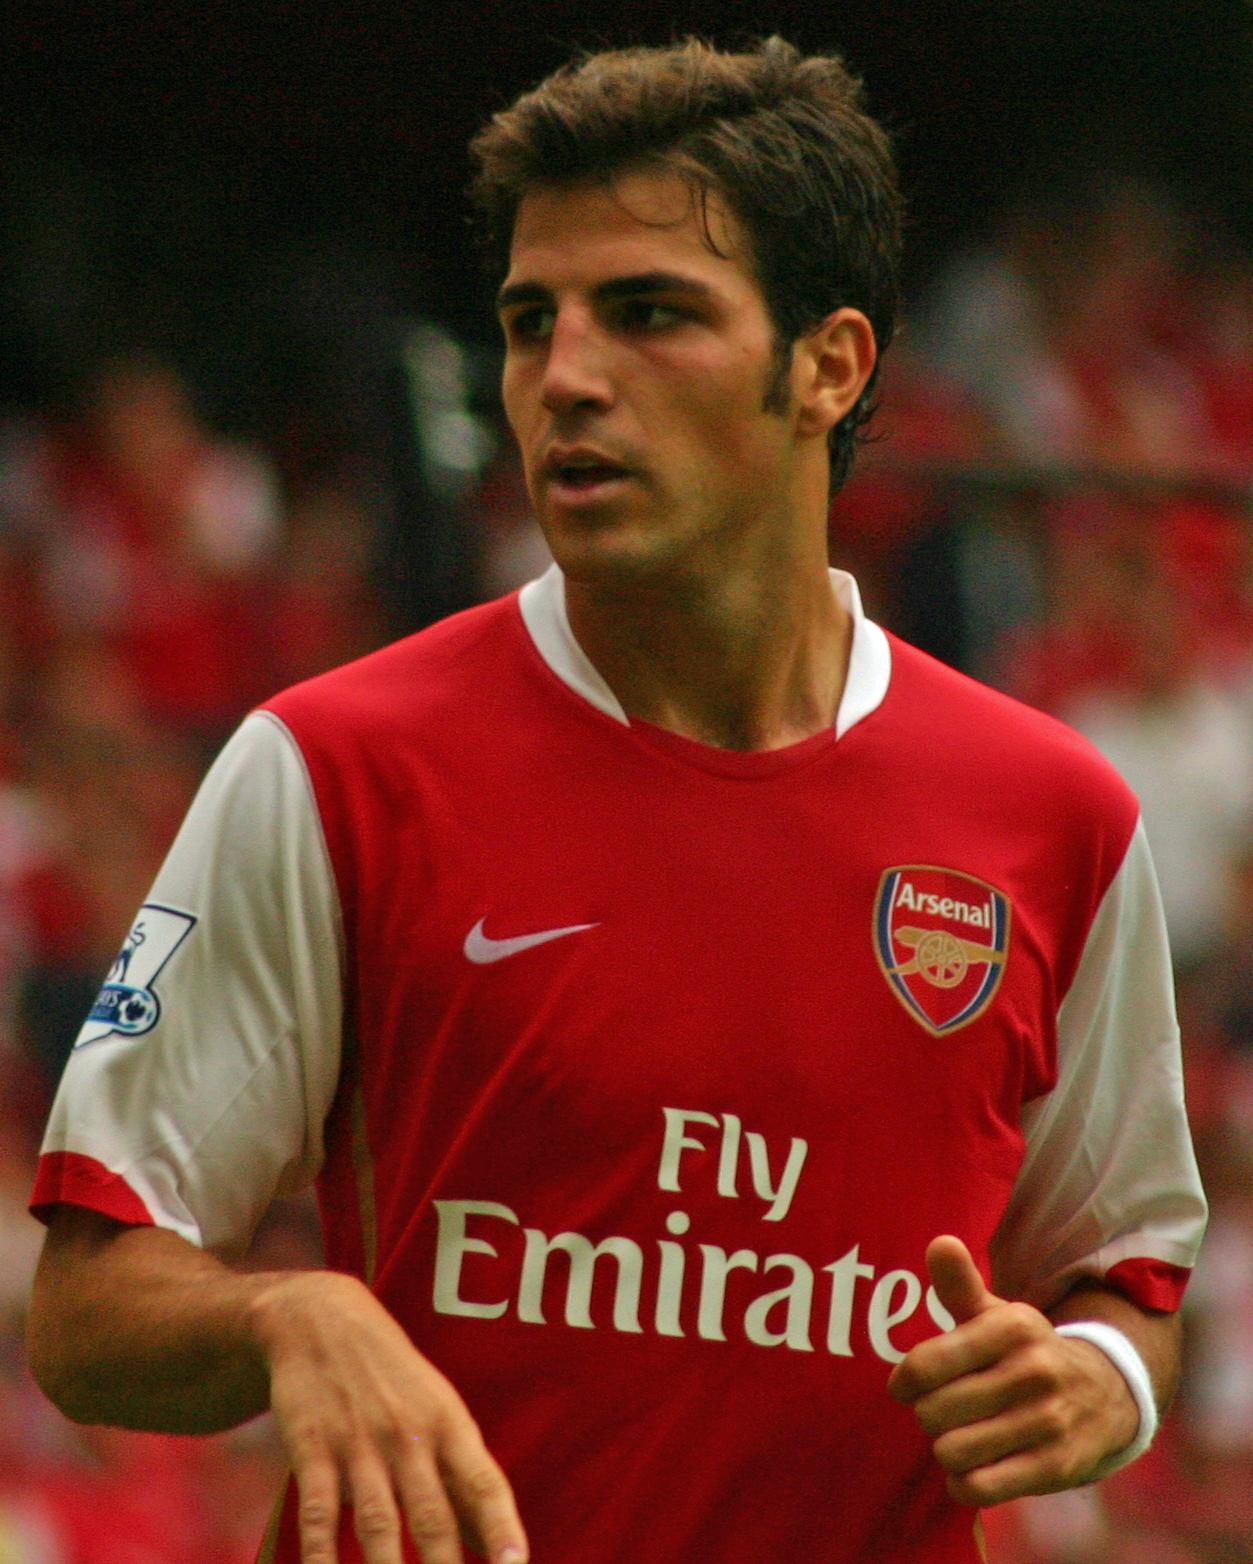 Image Result For Arsenal